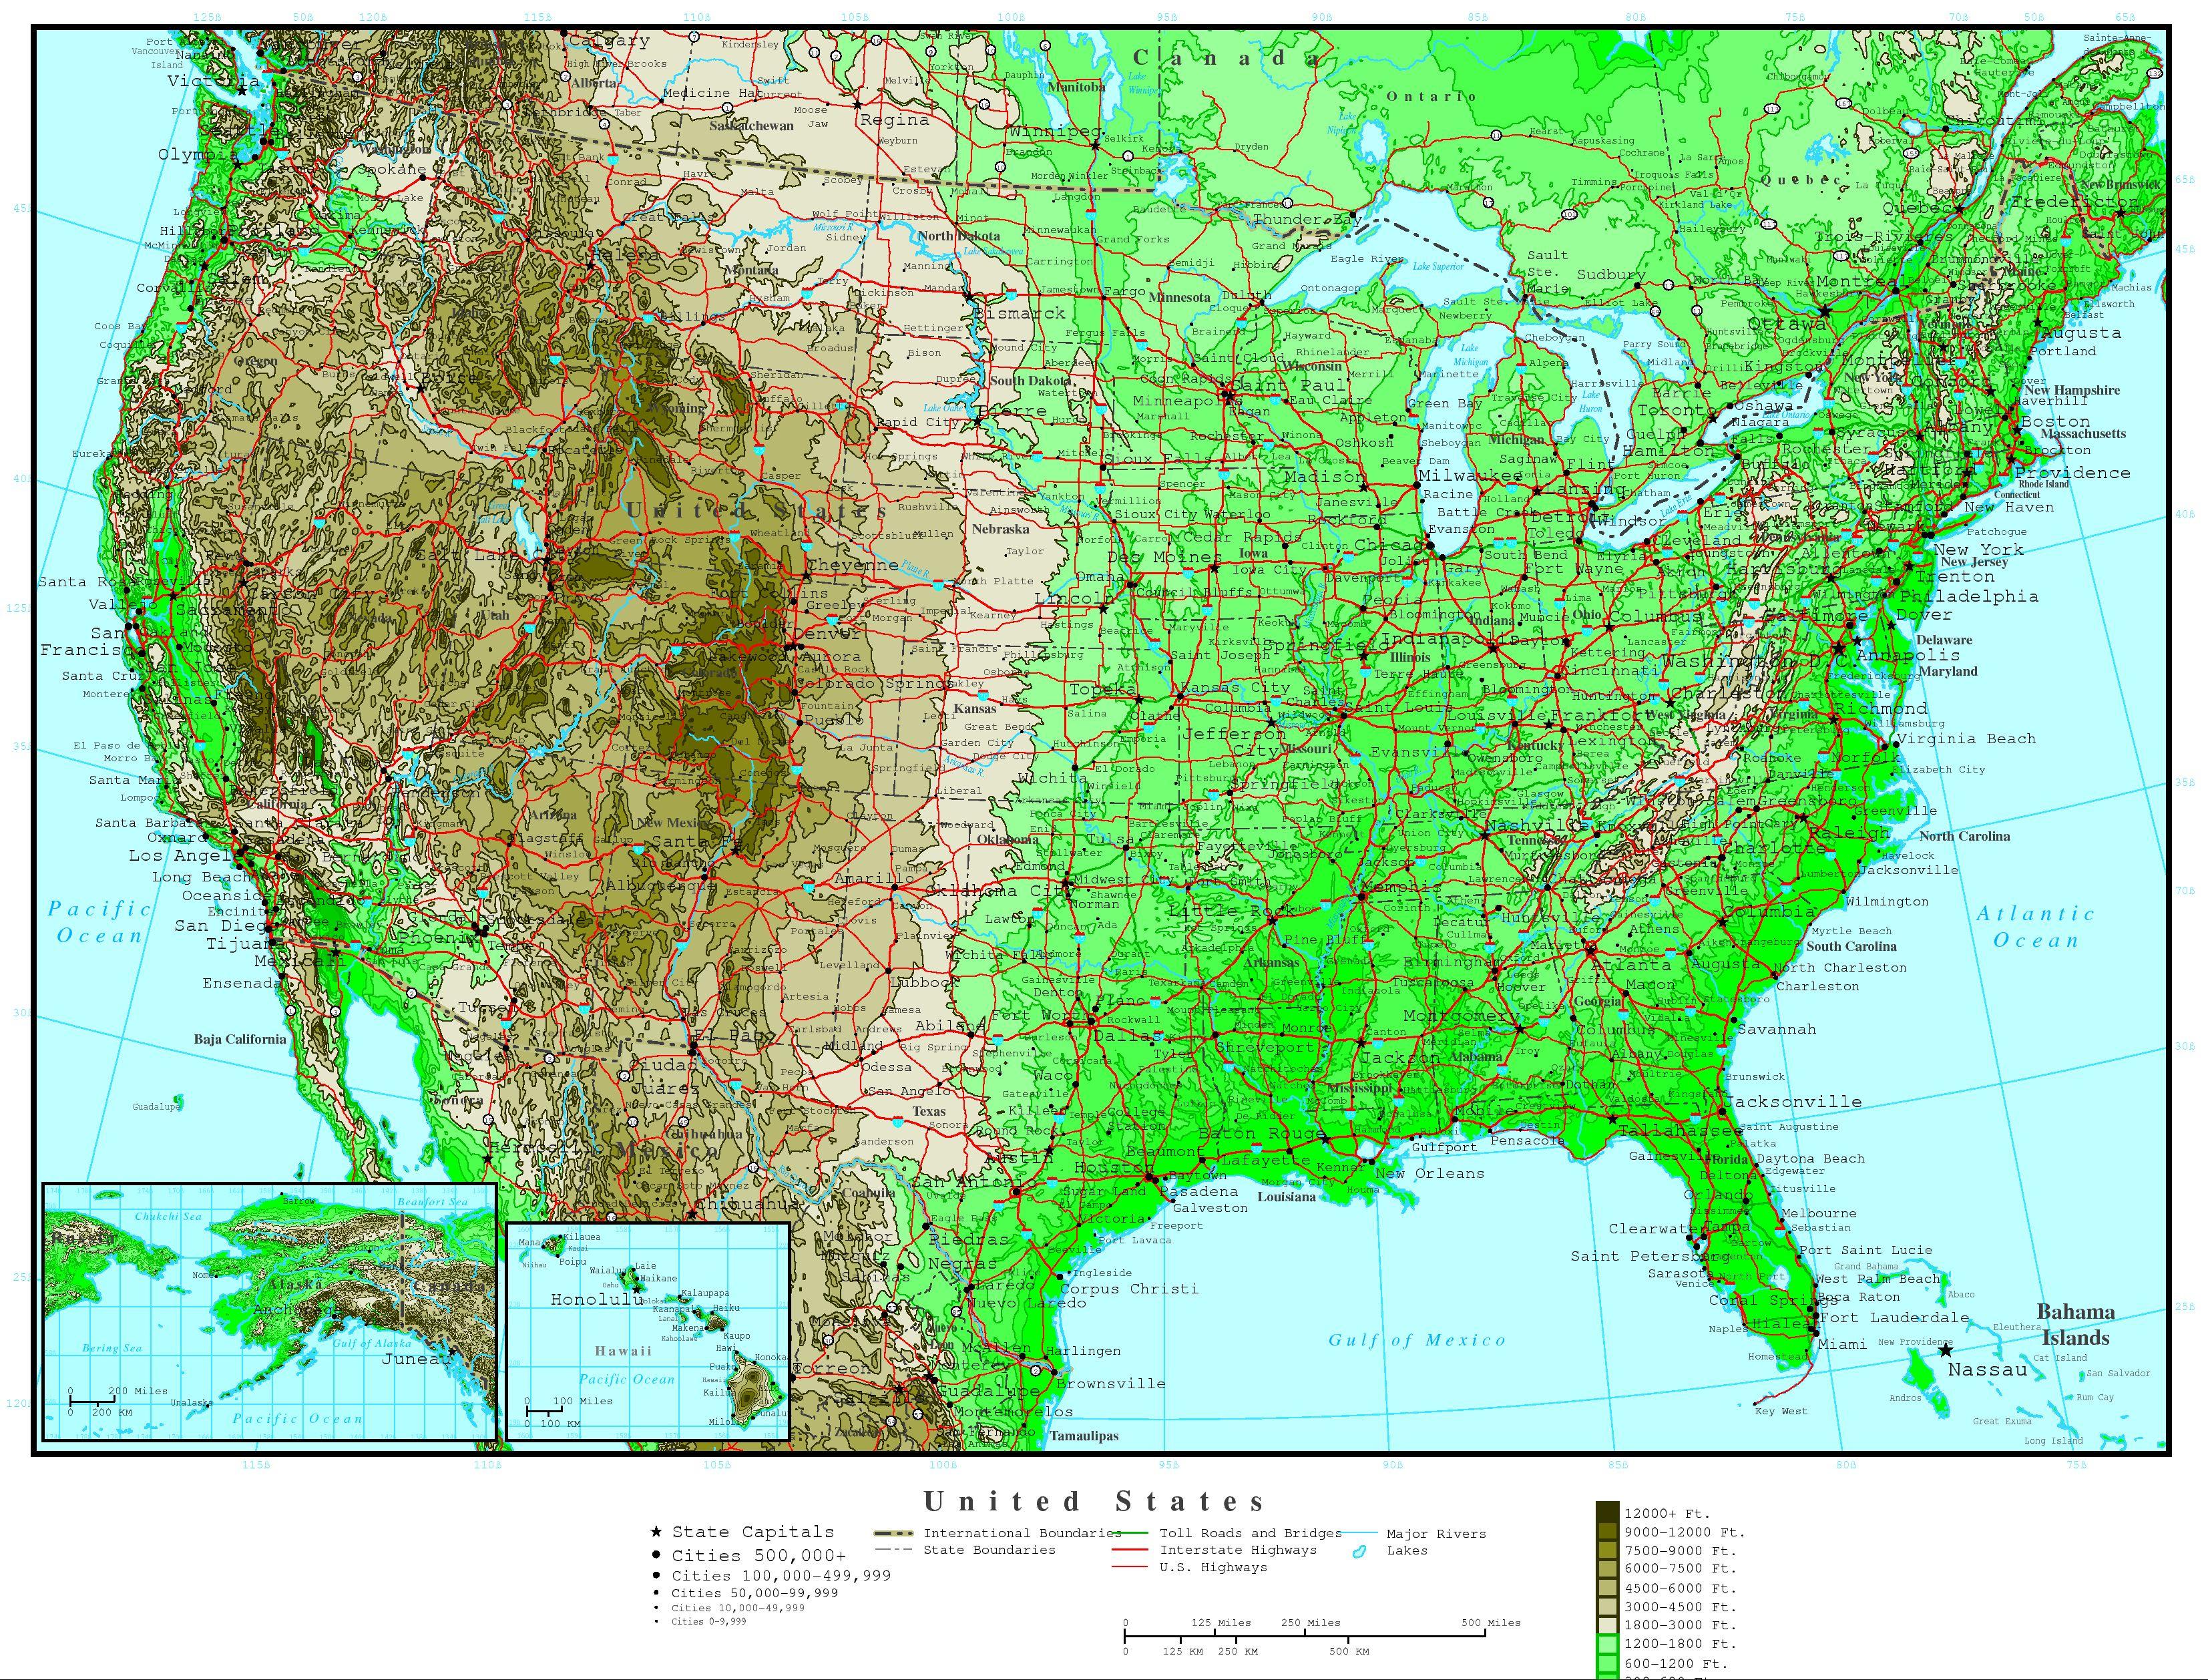 United States Elevation Map - Florida Elevation Map By Address